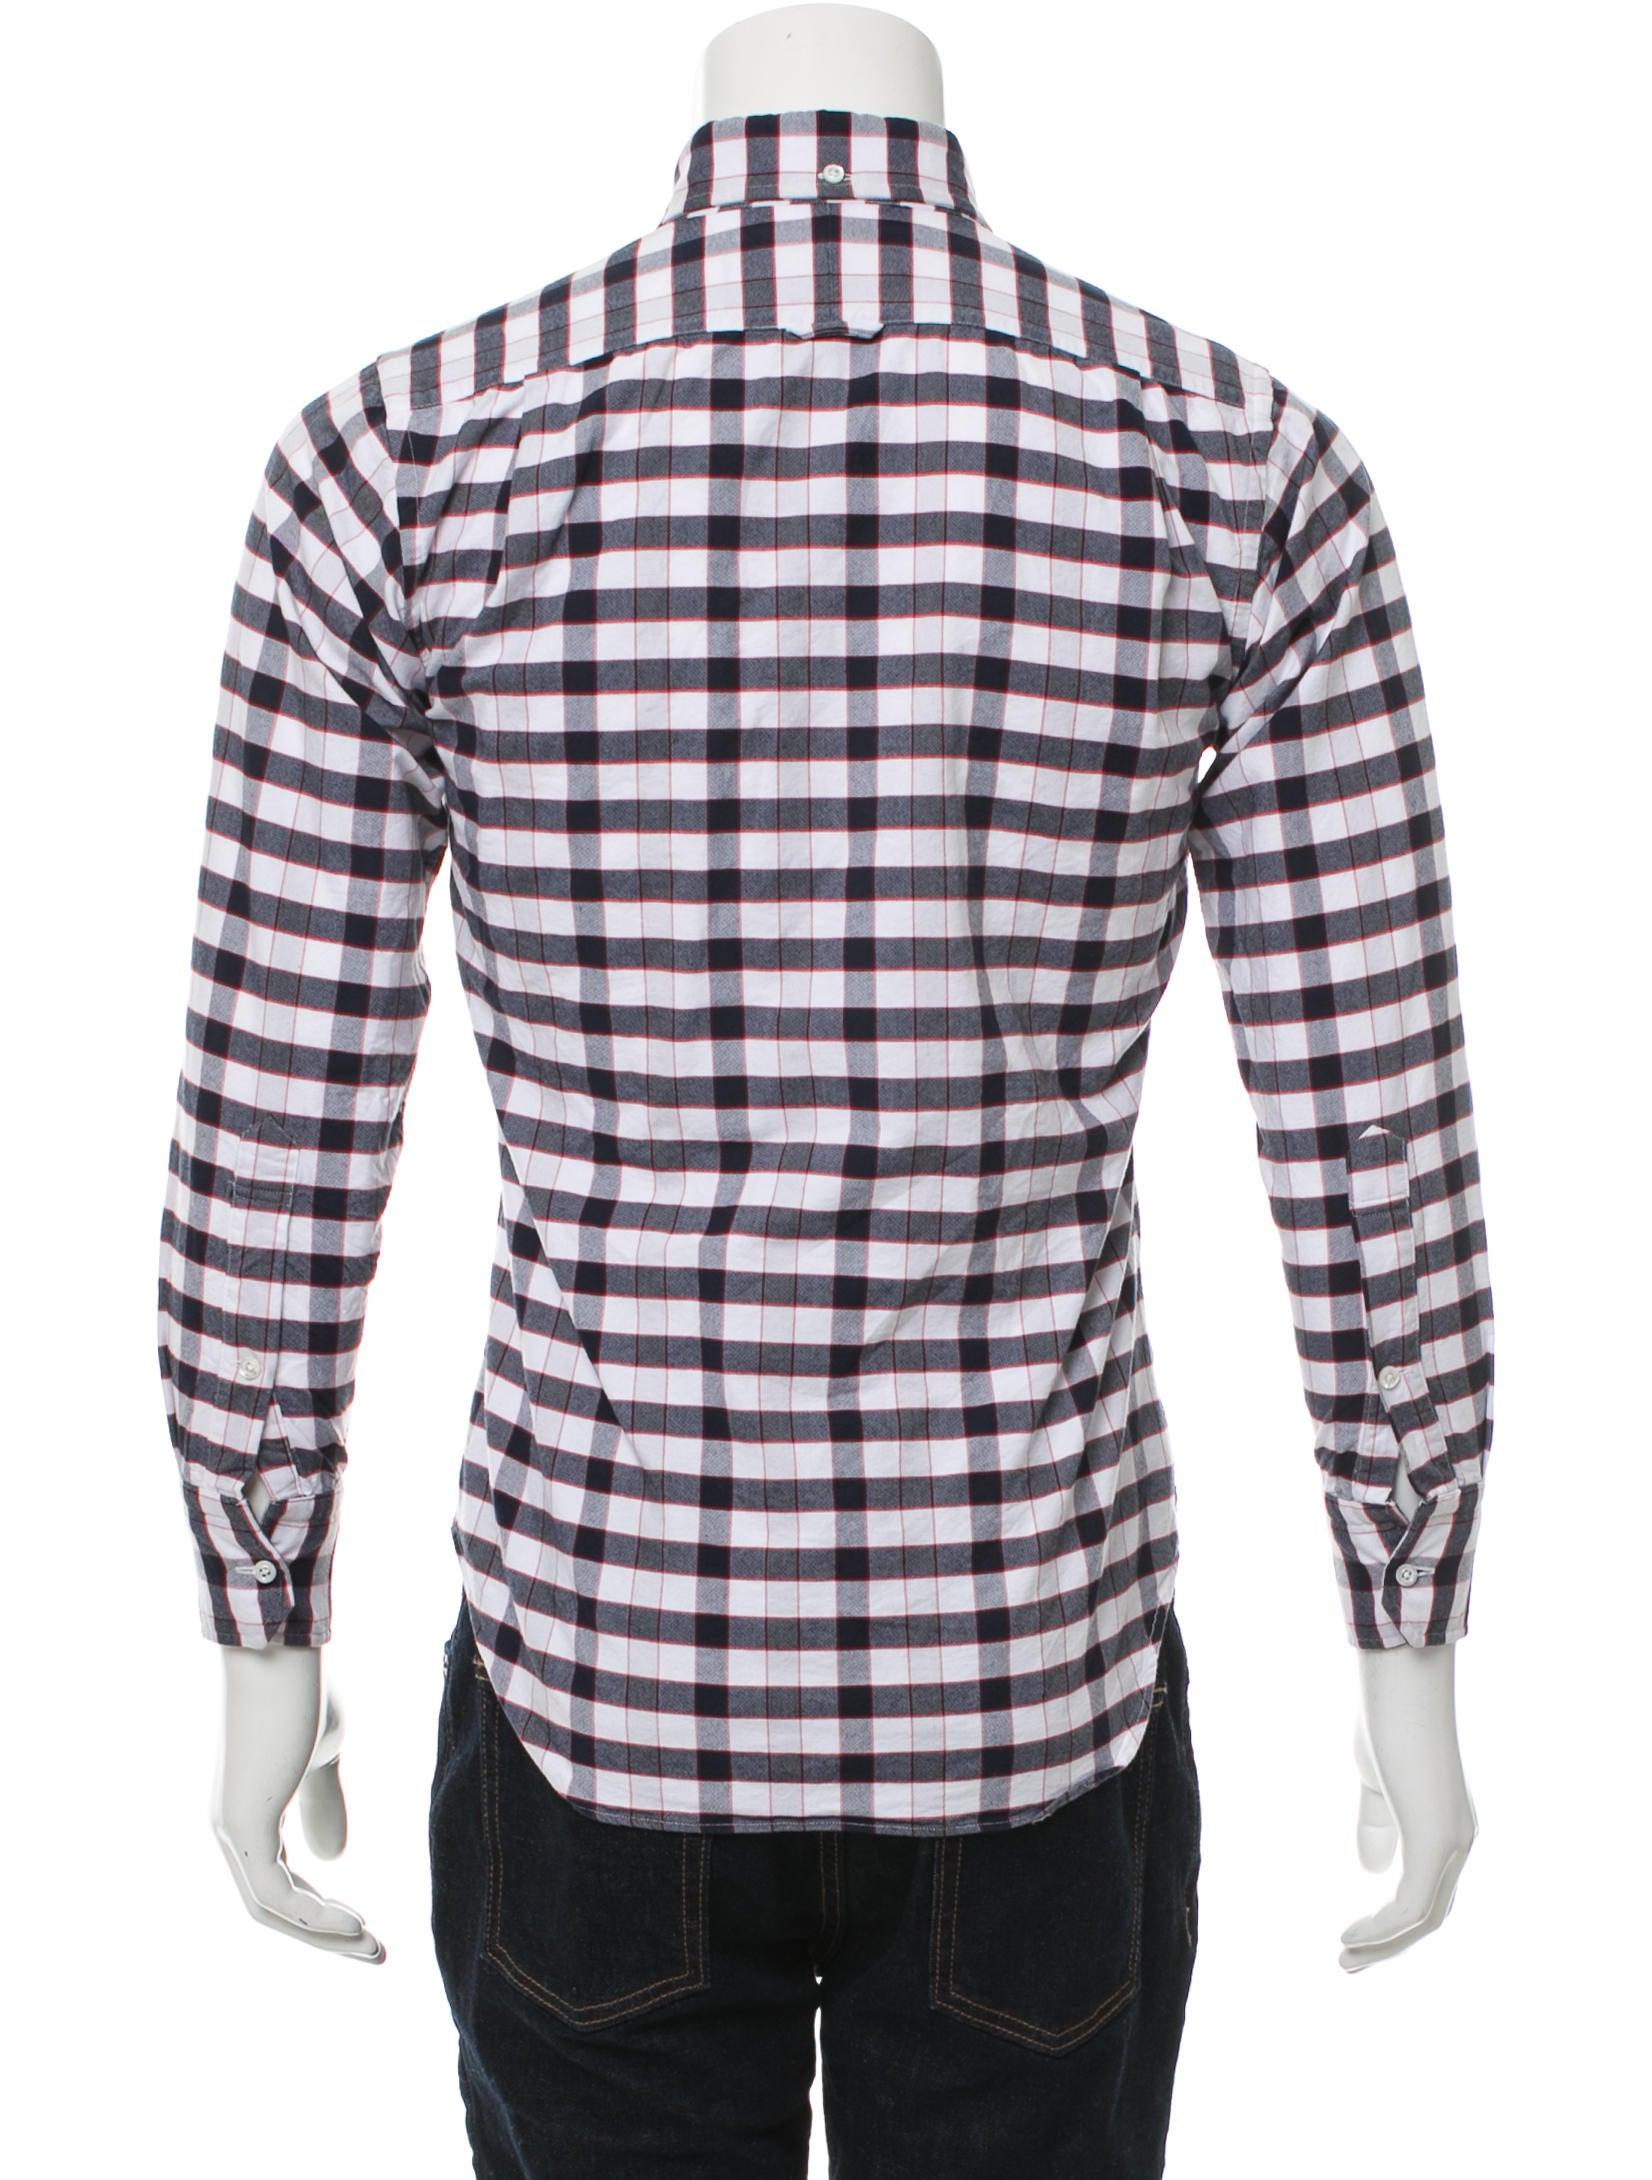 Thom browne plaid button up shirt clothing tho22171 for Thom browne shirt sale